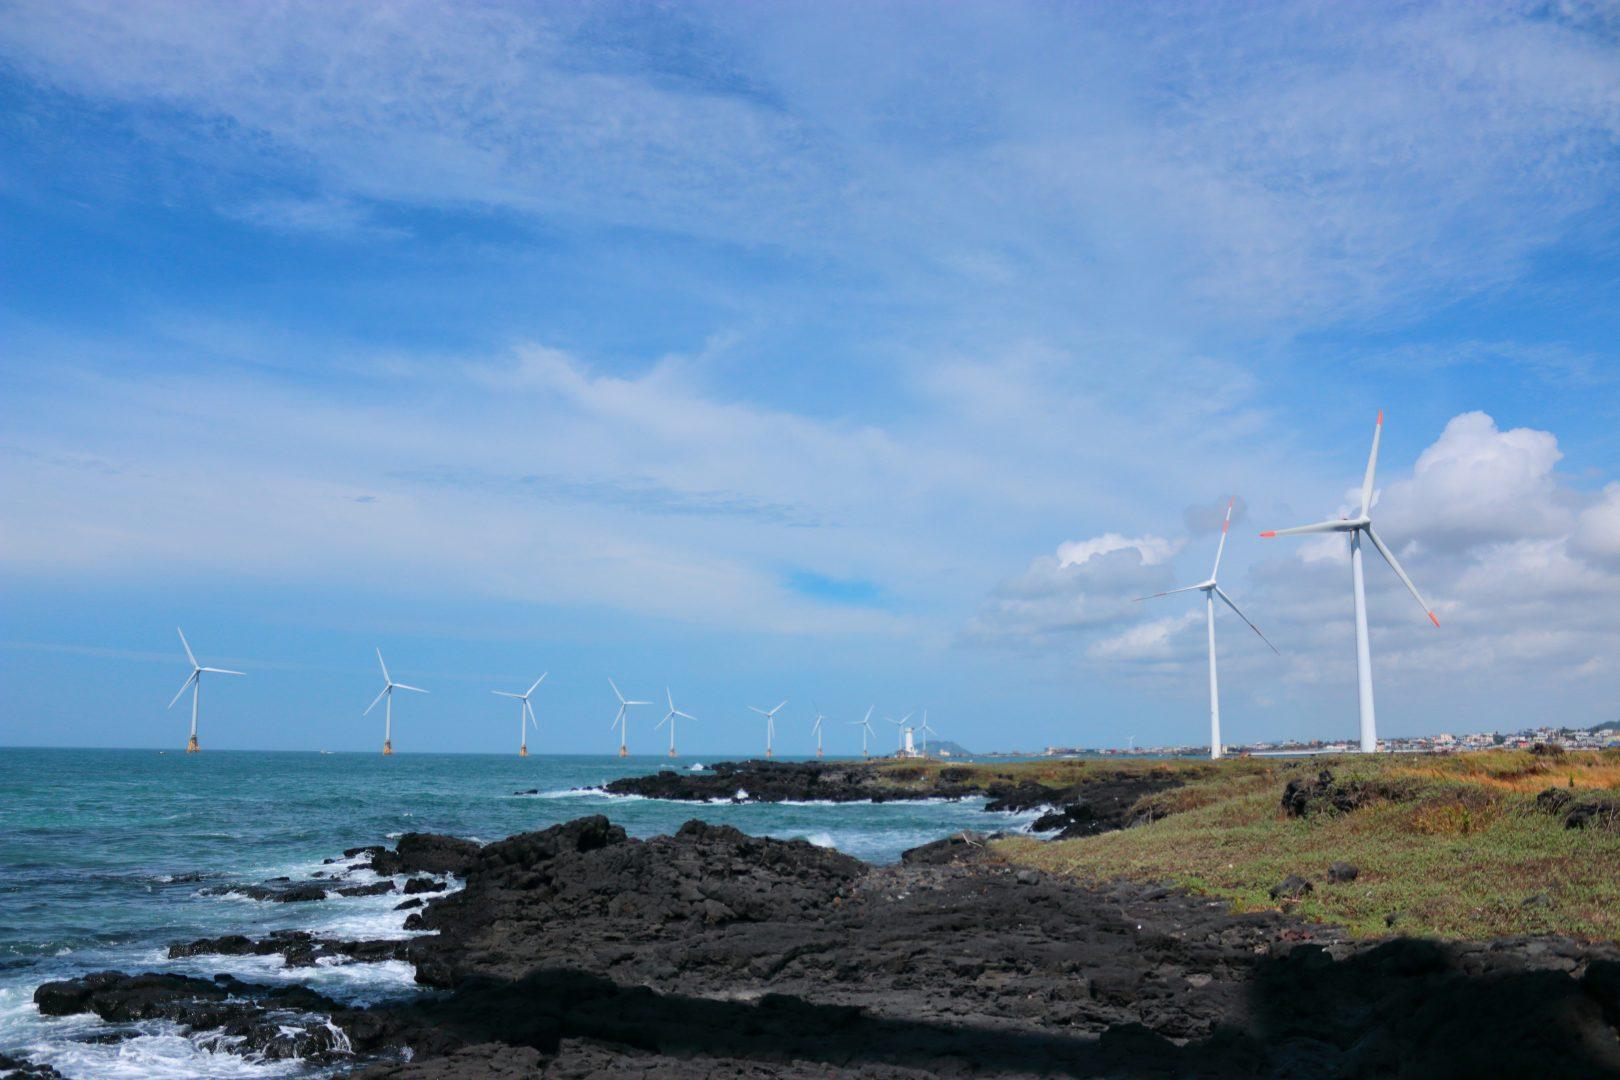 France Energie Eolienne nomination president